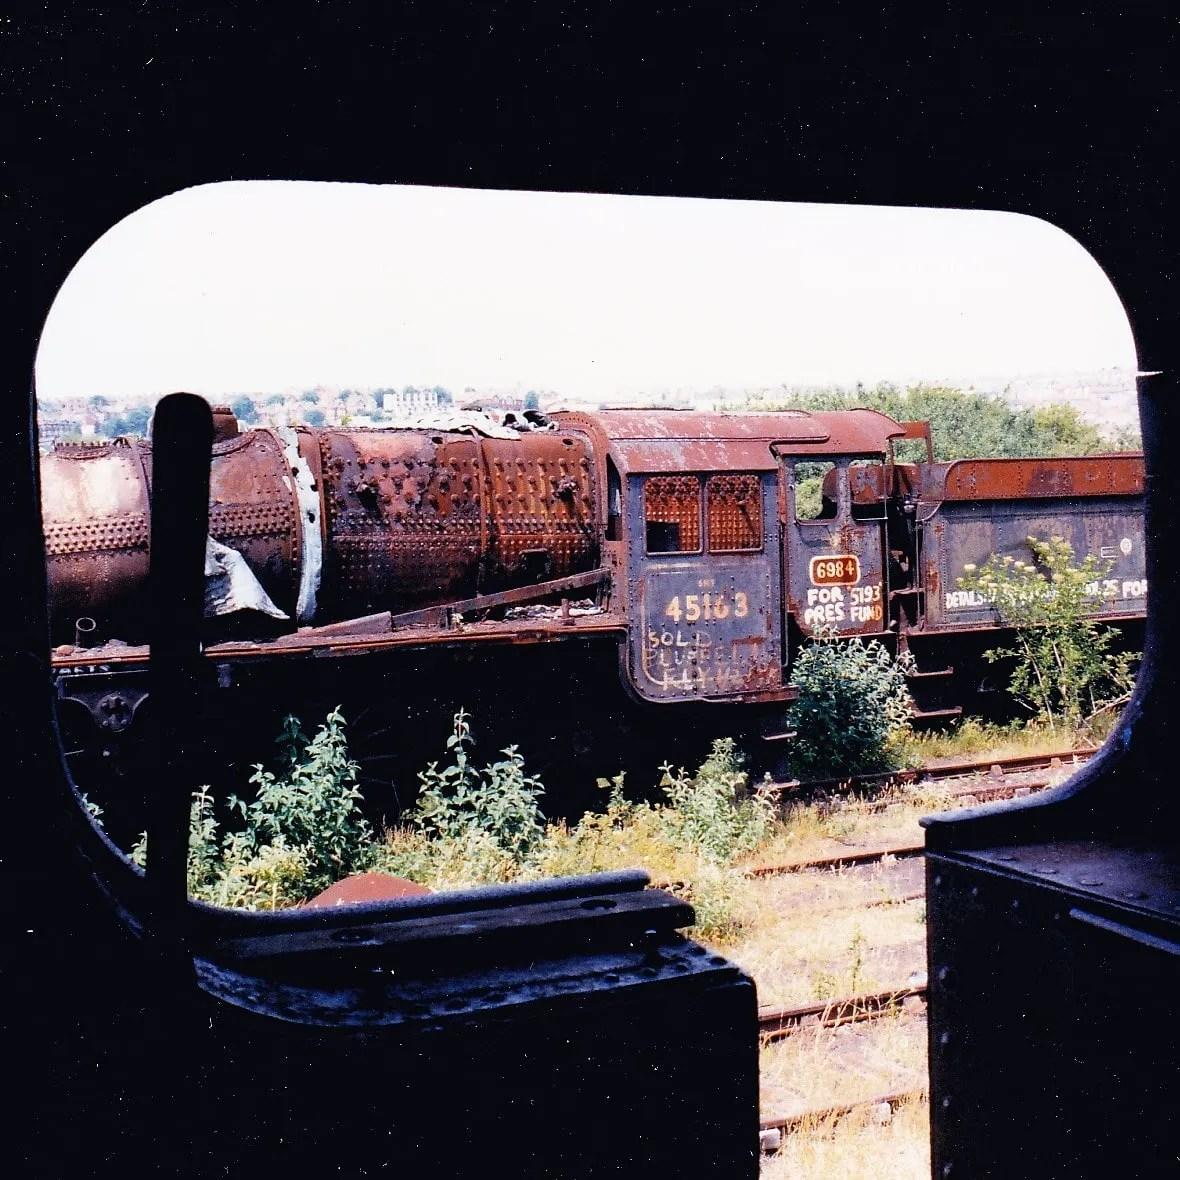 Stanier Black Five locomotive 45163 at Barry Scrapyard